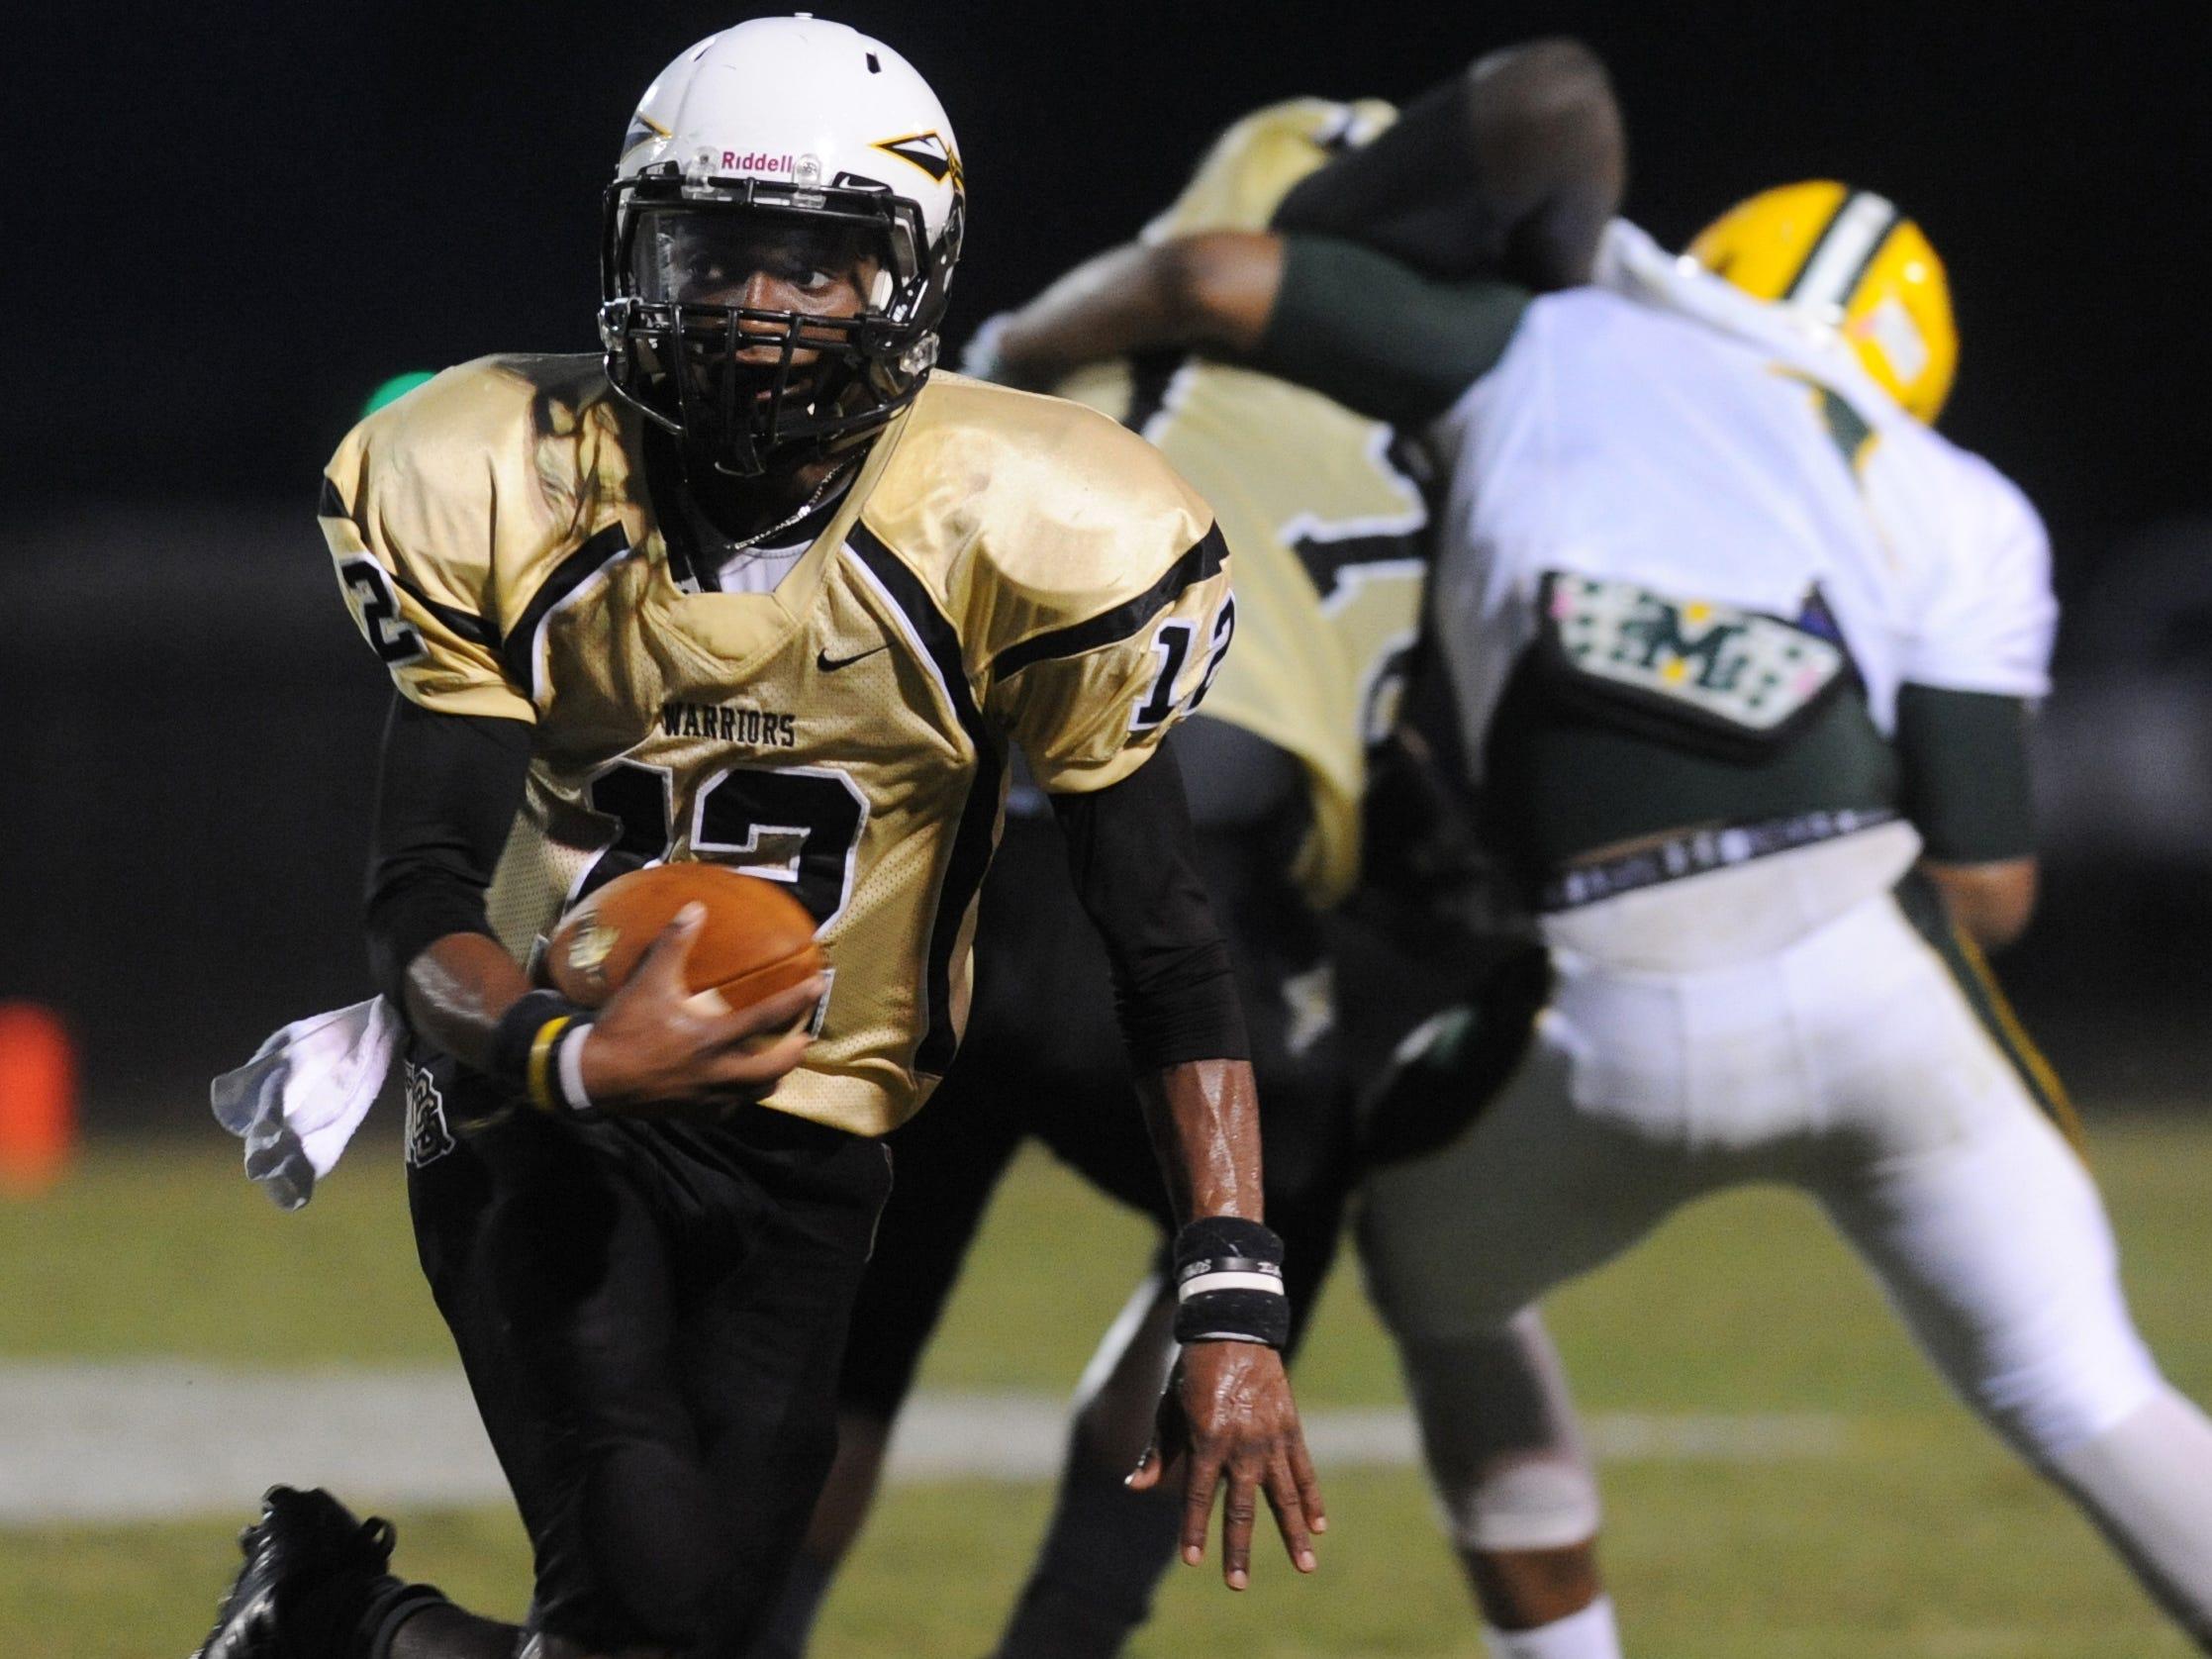 Oak Grove quarterback J.C. Keys (12) runs the ball as the Warriors face McComb Friday night in the Lamar County football jamboree in Sumrall.